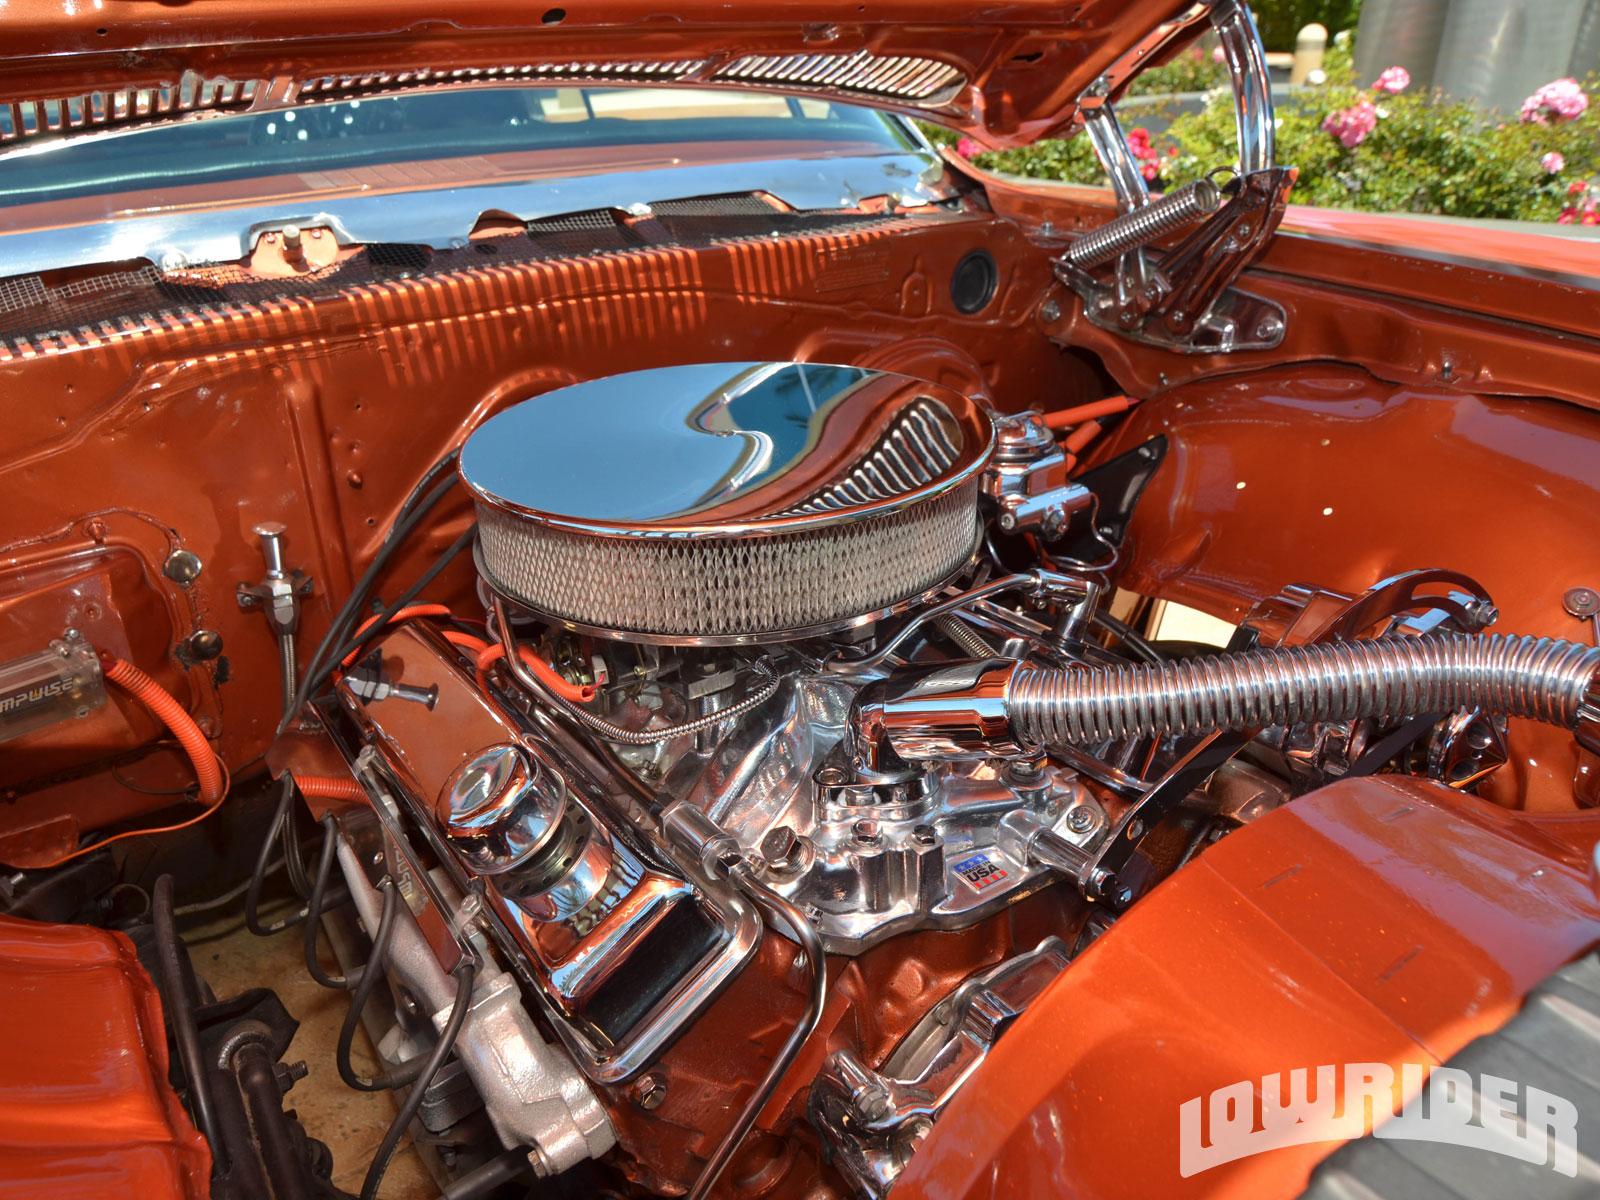 Lrmp O Chevrolet Impala Chevy Engine on 2012 Chevy Caprice Engine